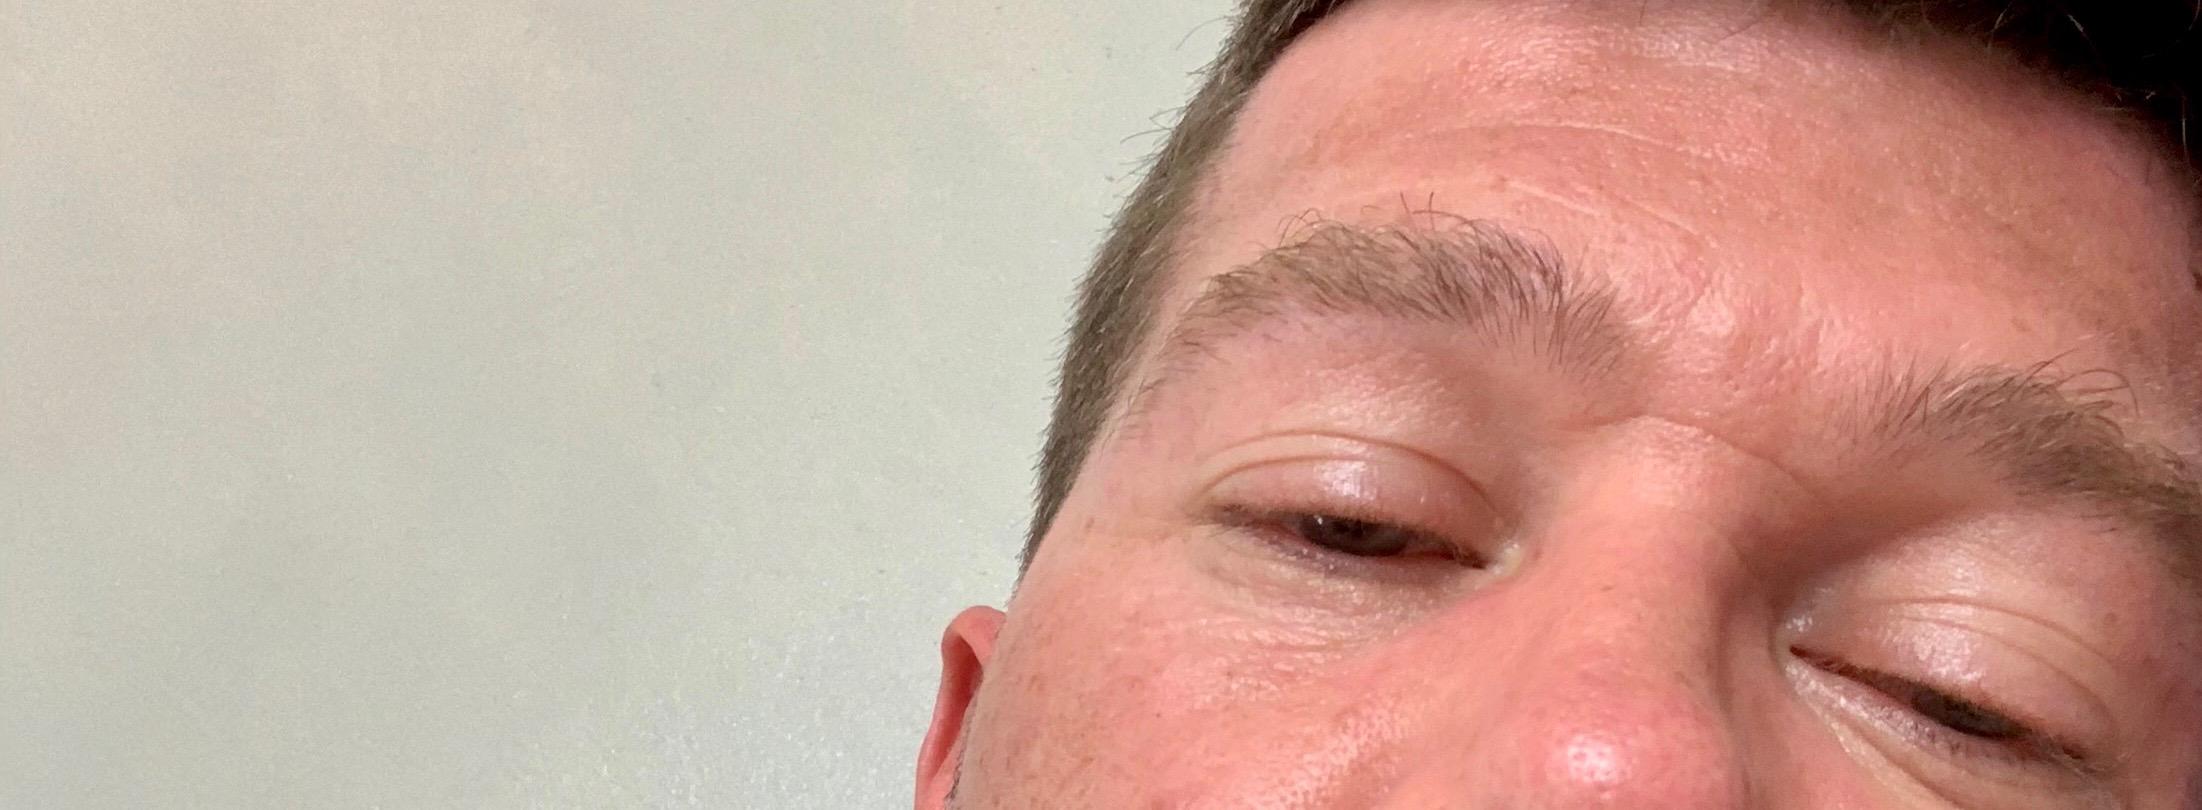 ryan-moulton-eyes-depression.jpg